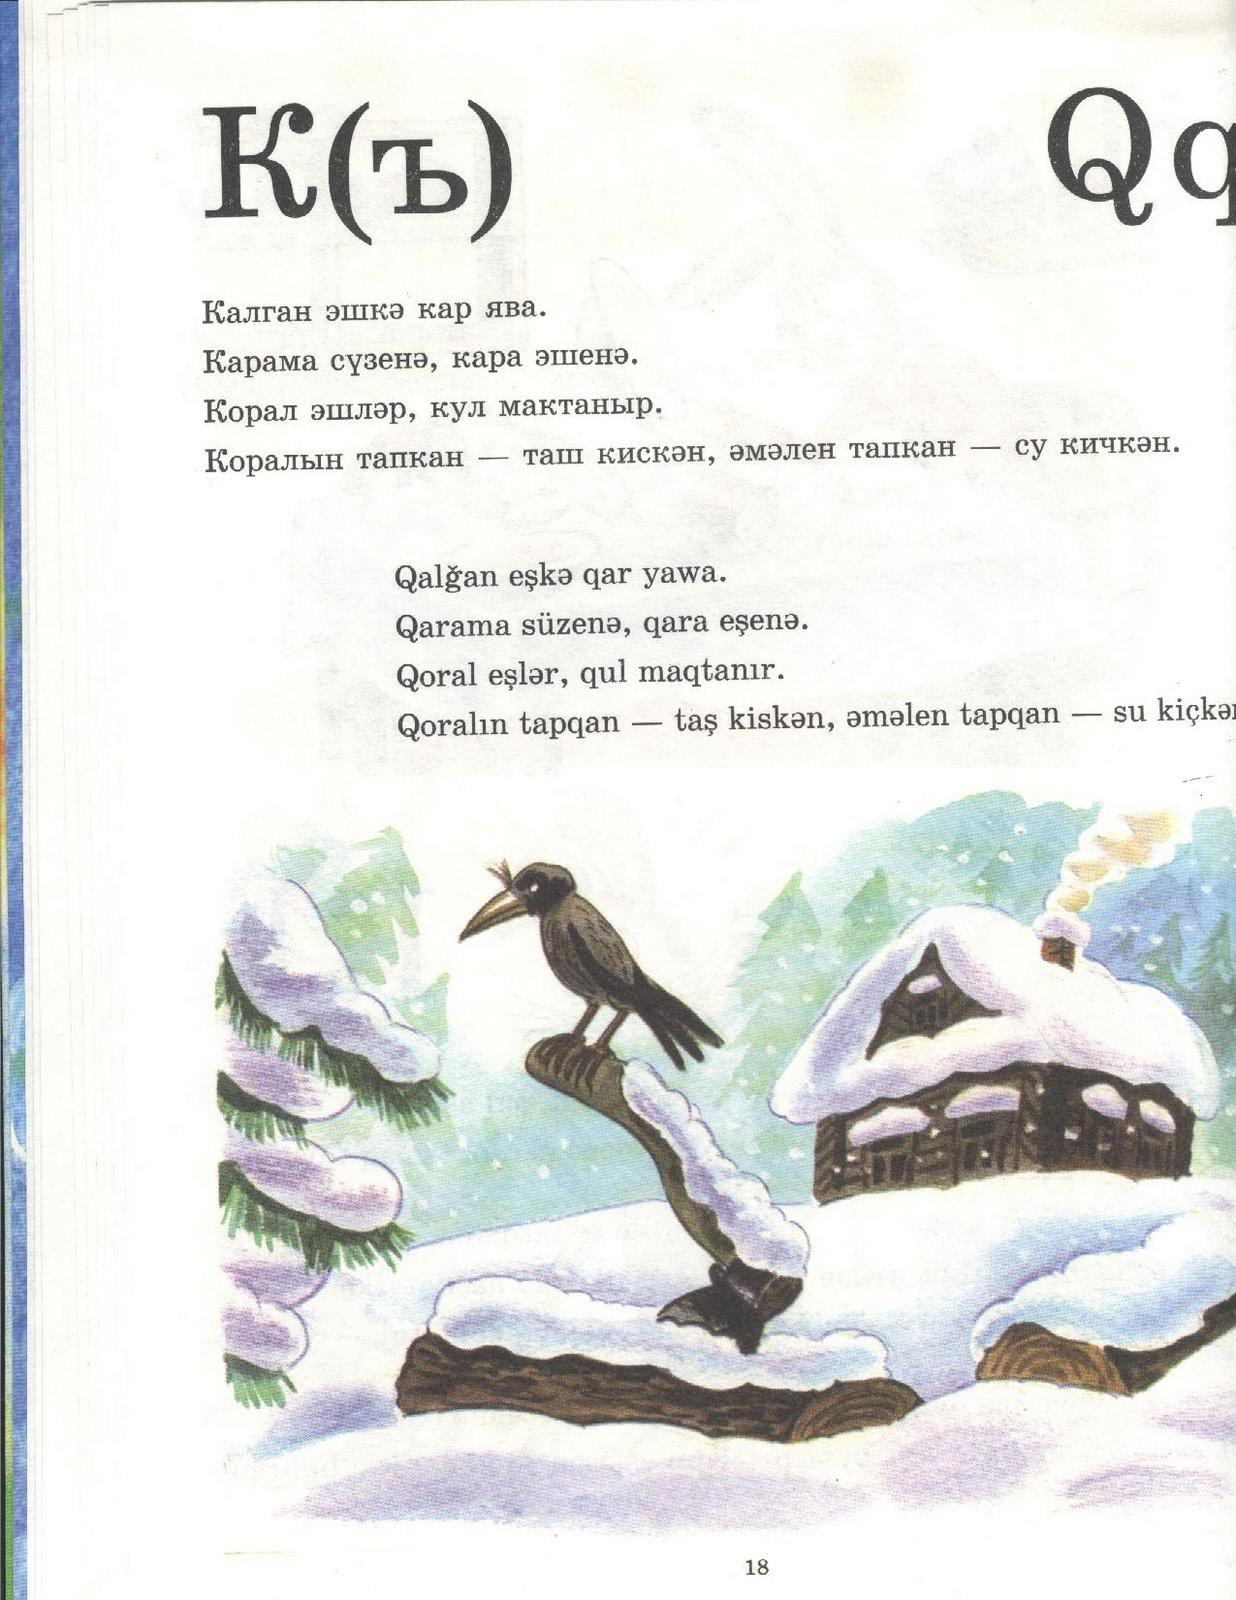 Kril-Latin Öğrenü Qq  Kk